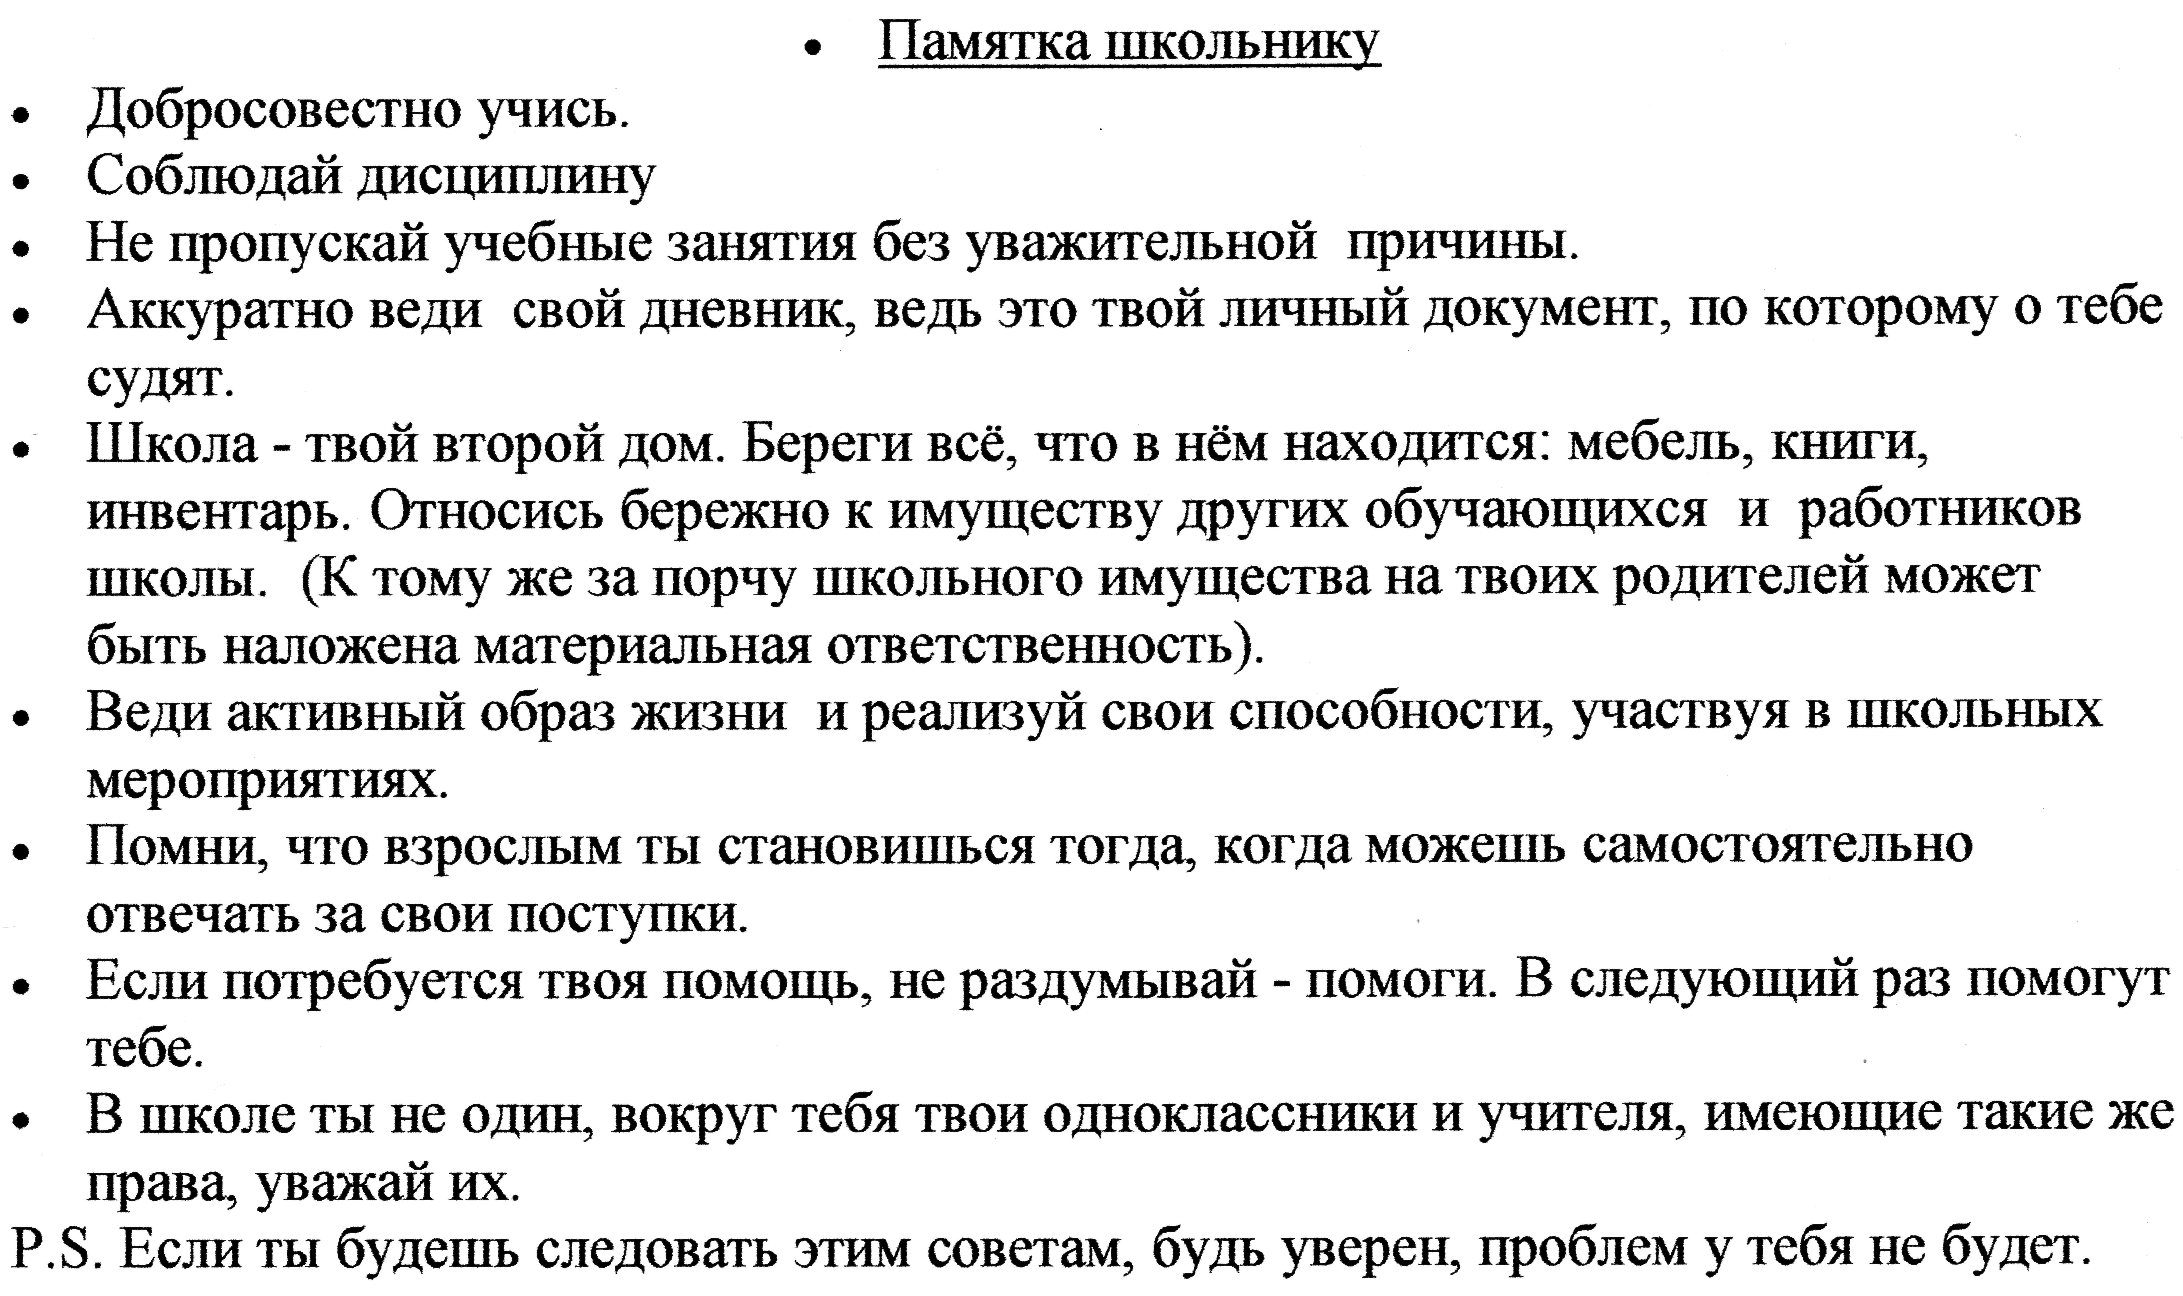 C:\Documents and Settings\Admin\Рабочий стол\img245.jpg